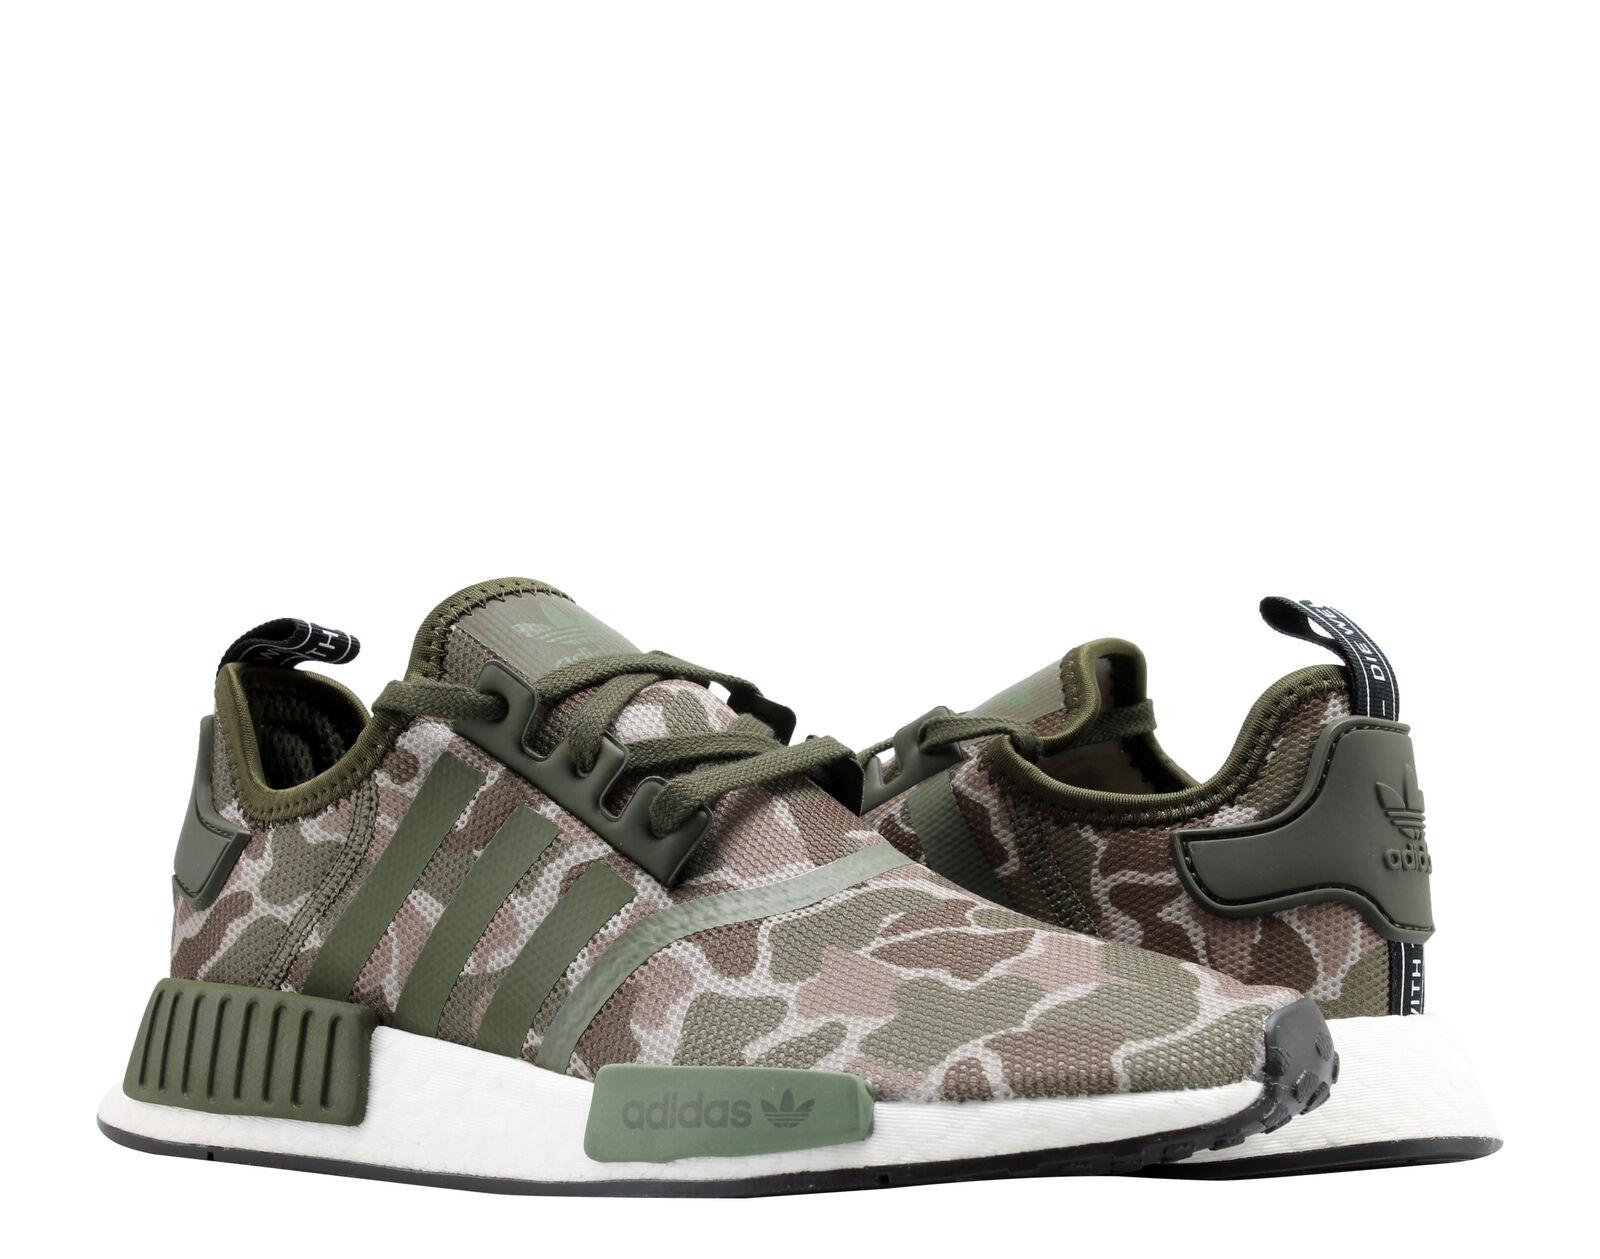 Men Adidas NMD Xr1 Green Camo Sneaker BA7232